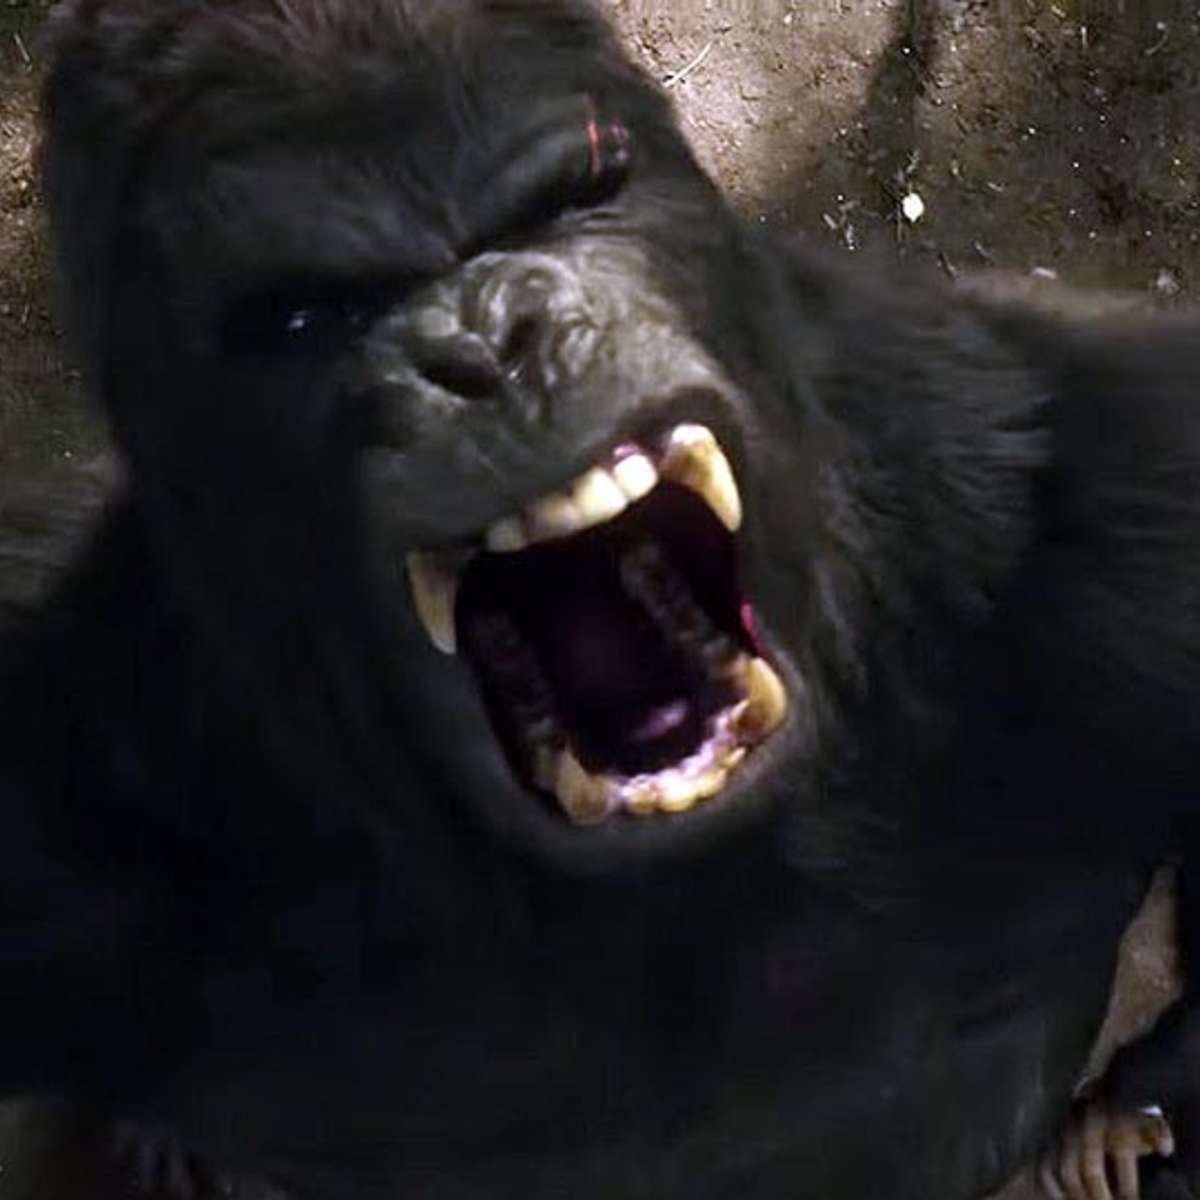 dc_legends_of_tomorrow_gorilla_grodd_01.jpg